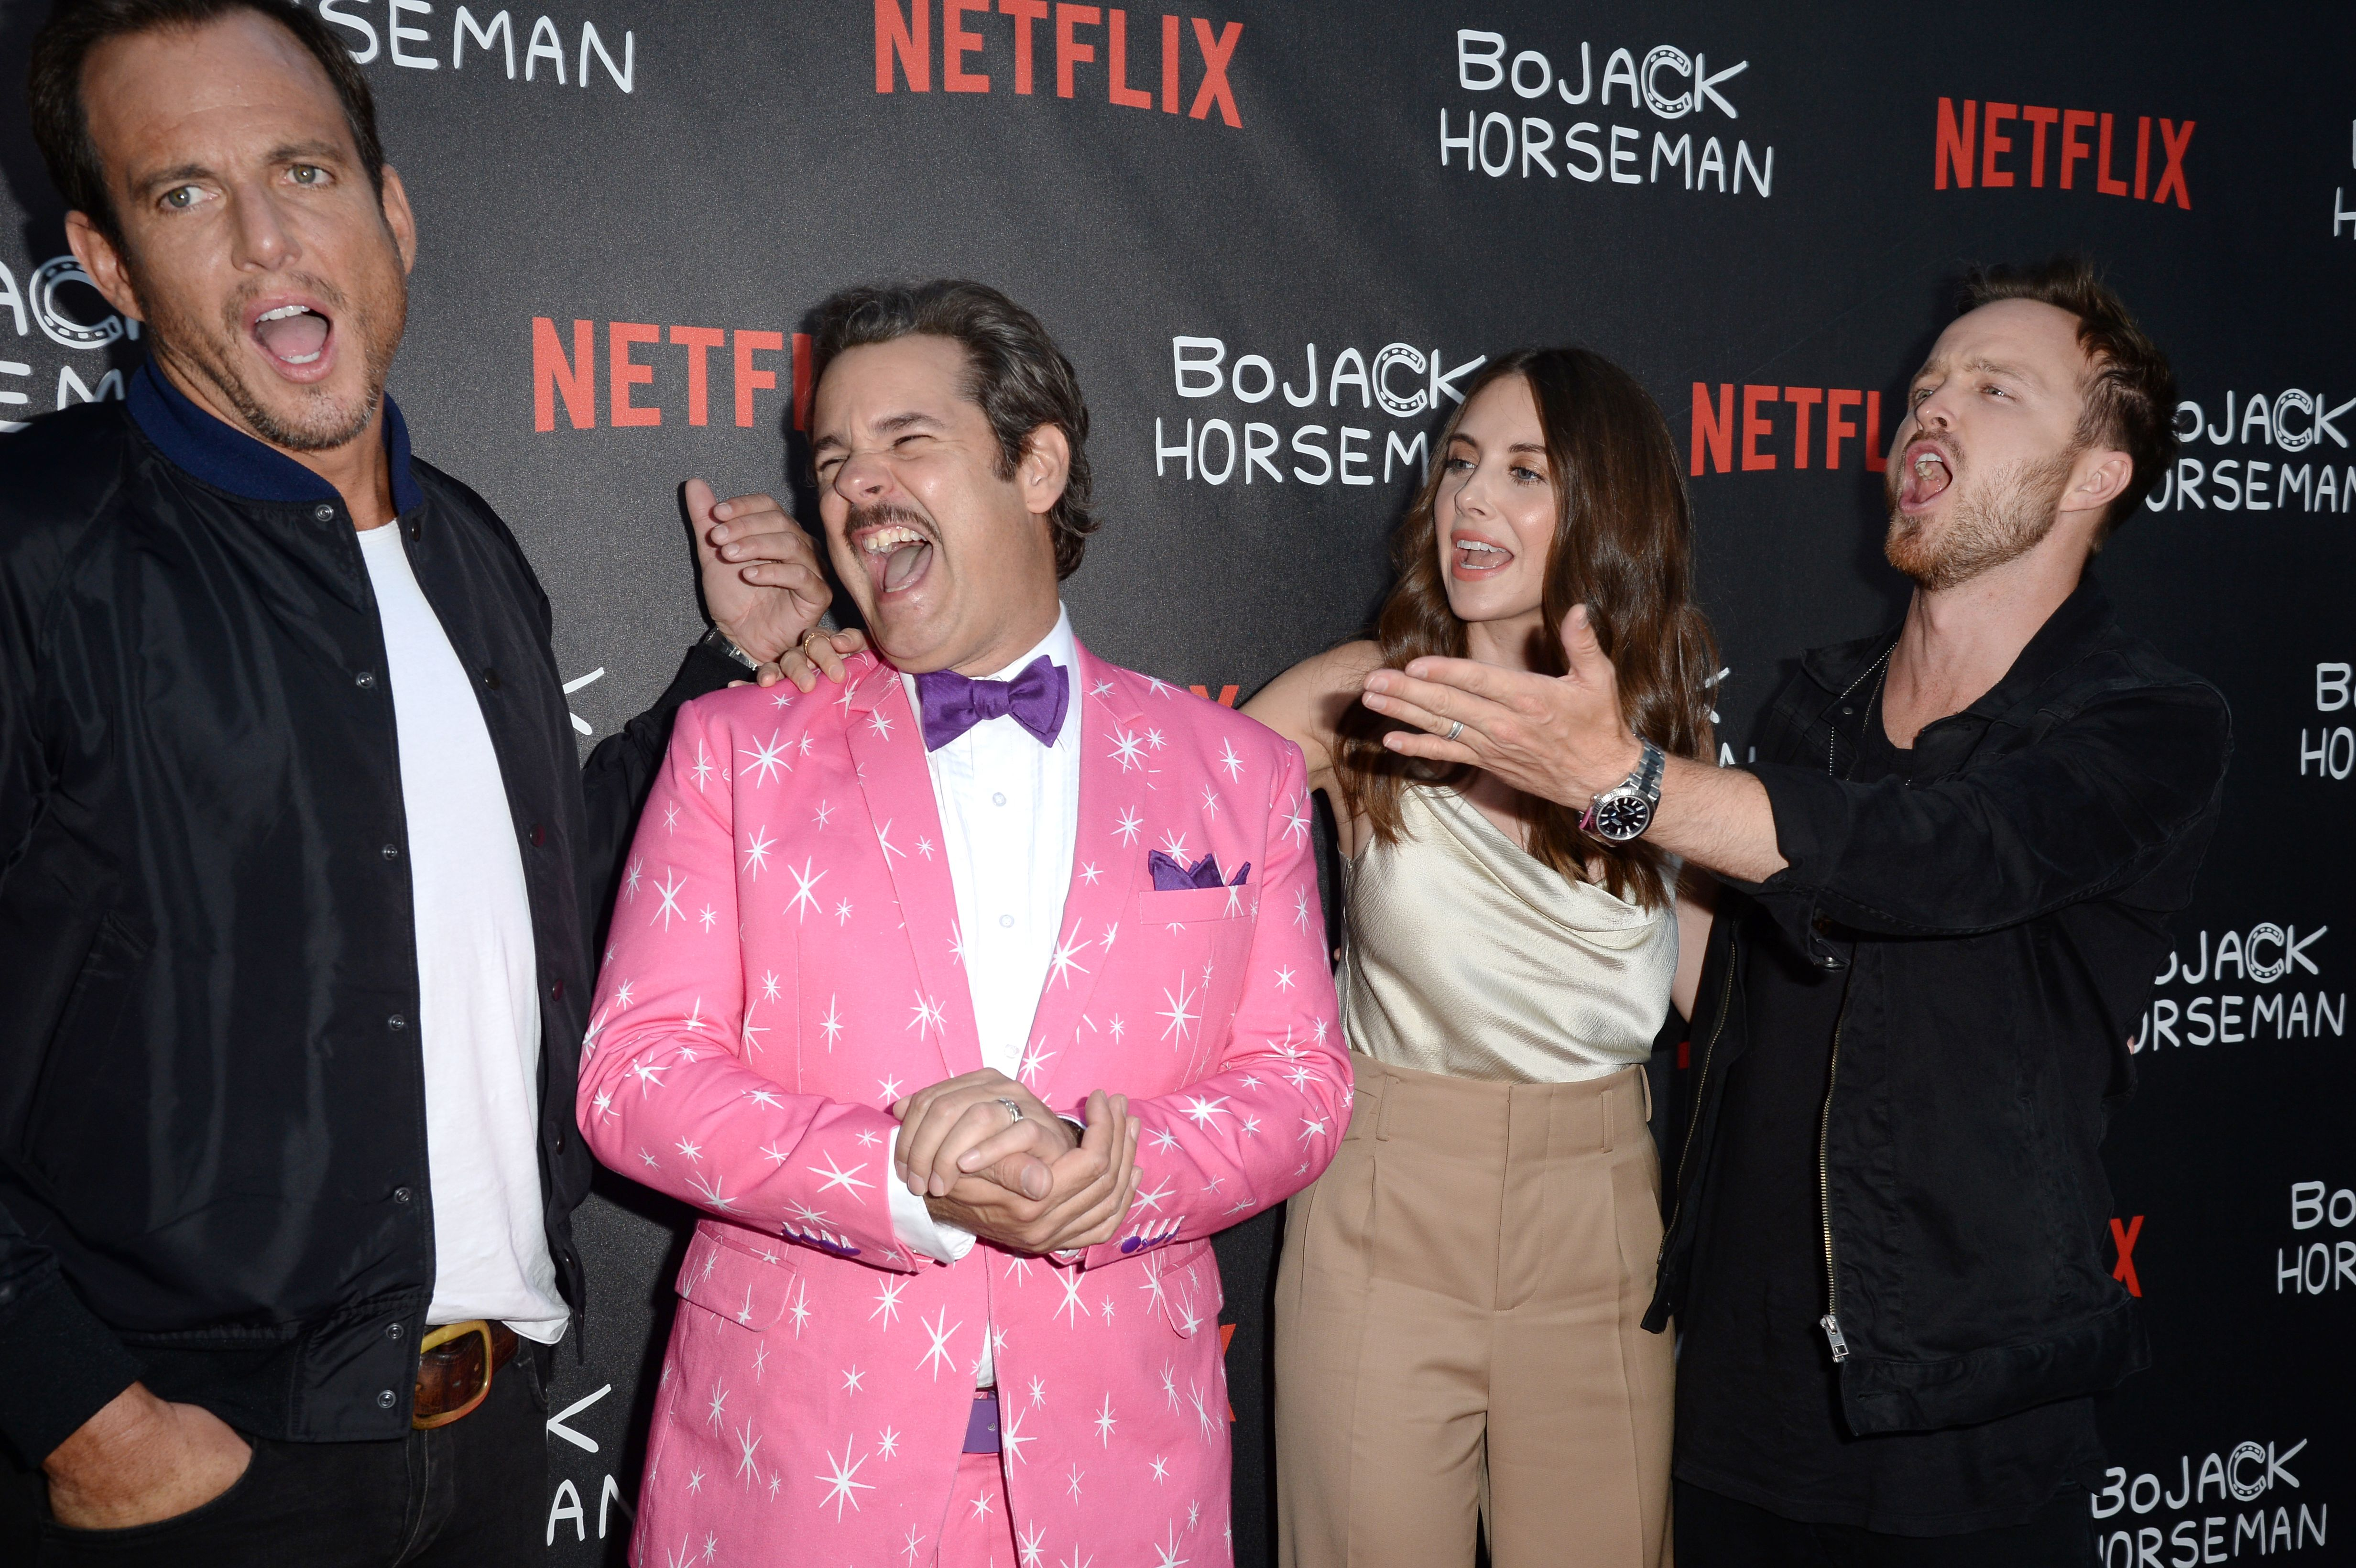 BoJack Horseman, Netflix, Will Arnett, Paul F. Tompkins, Alison Brie, Aaron Paul